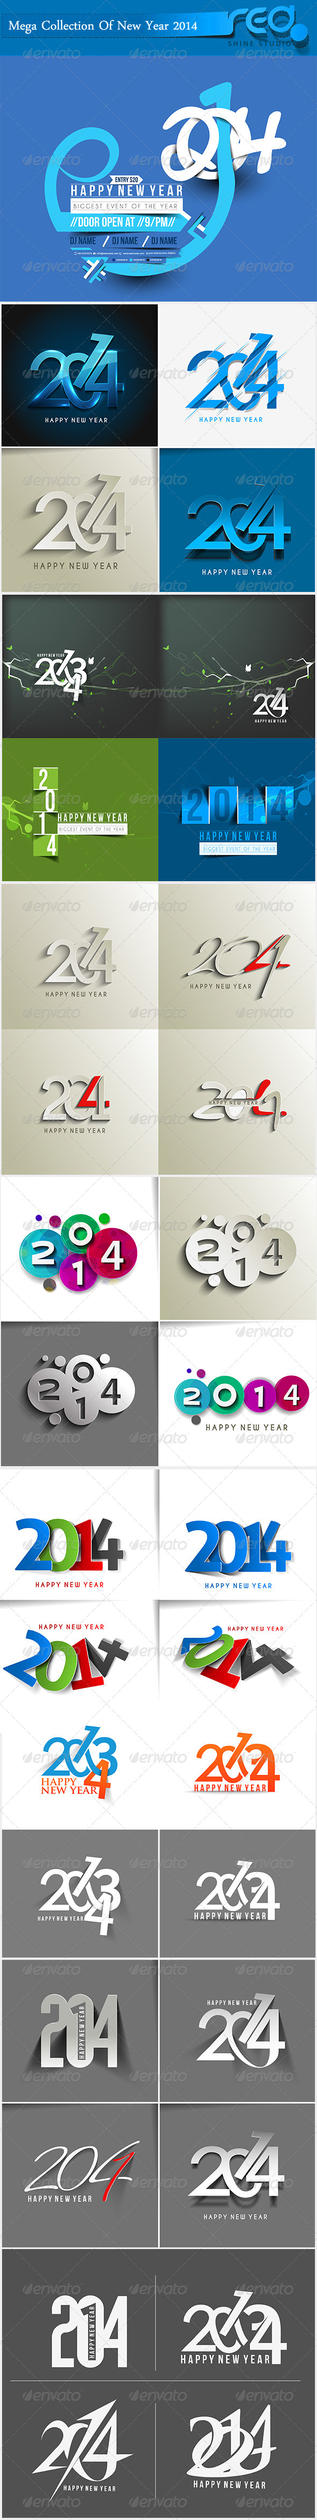 Happy New Year 2014 Background by Redshinestudio